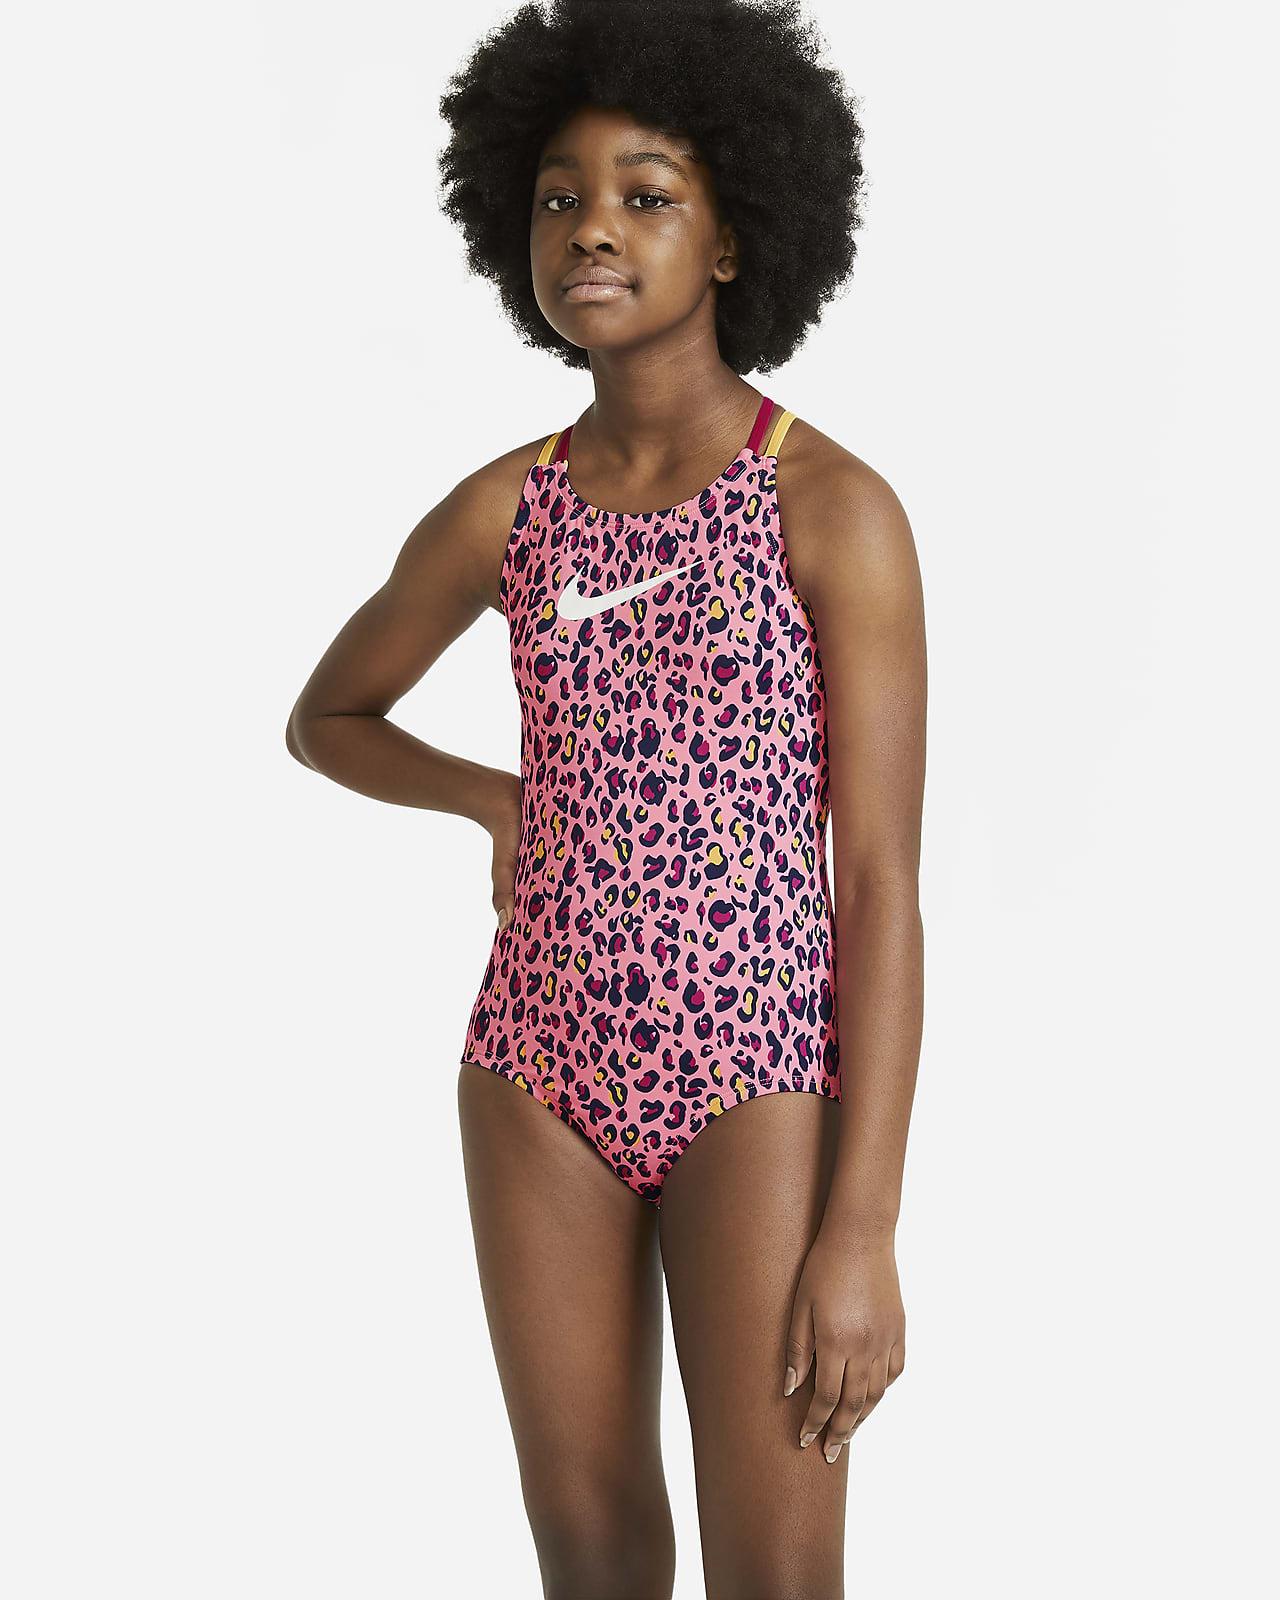 Nike Big Kids' (Girls') Spiderback 1-Piece Swimsuit